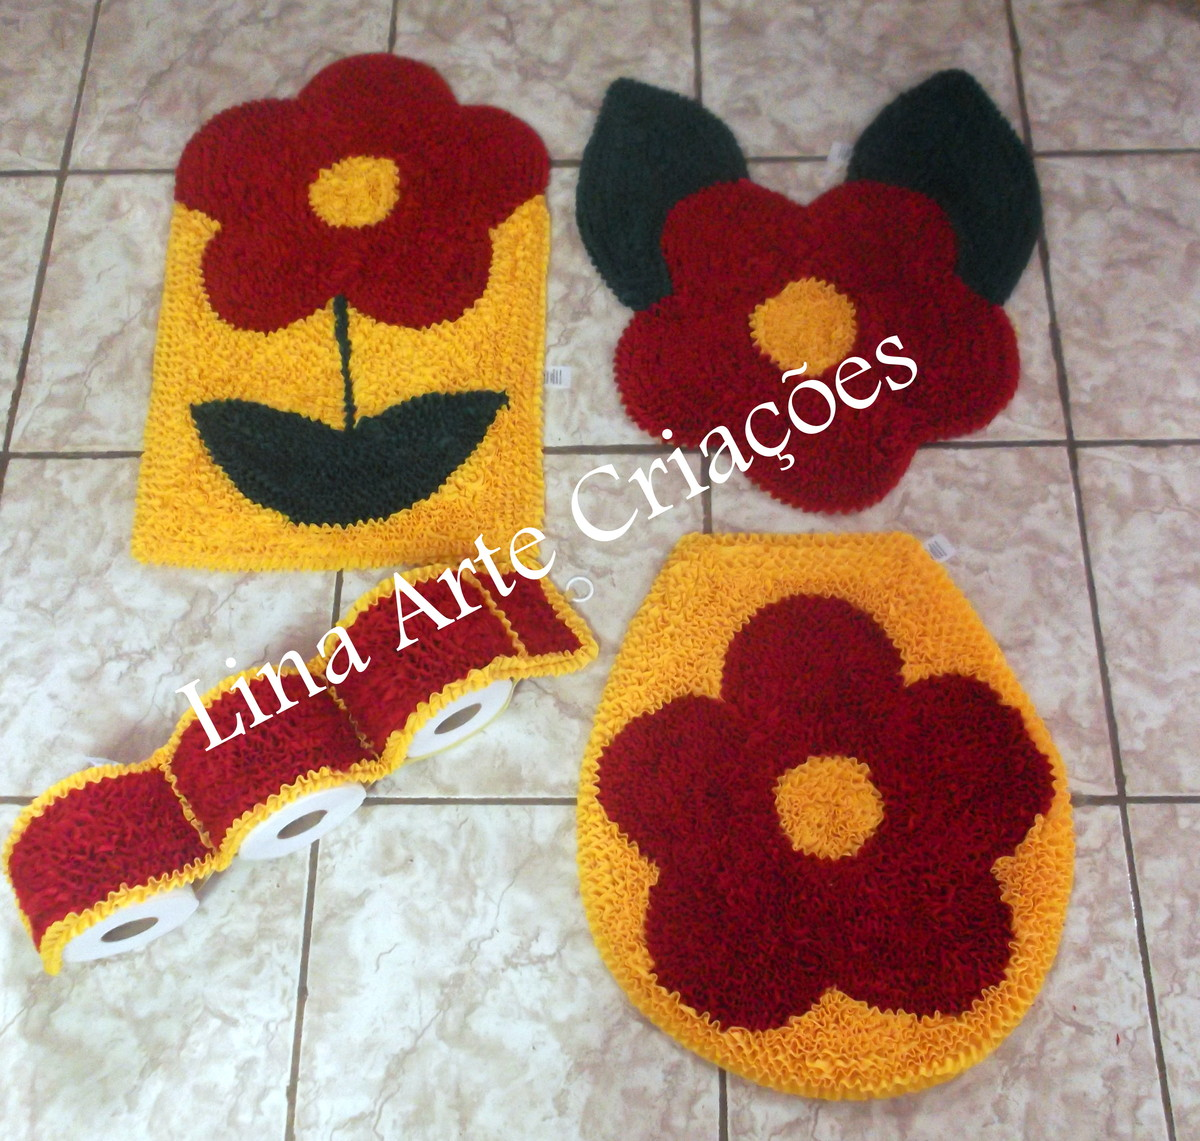 Tapete Floral Para Banheiro : tapetes-jogo-de-banheiro-flor-4-pecas-jogo-de-banheiro